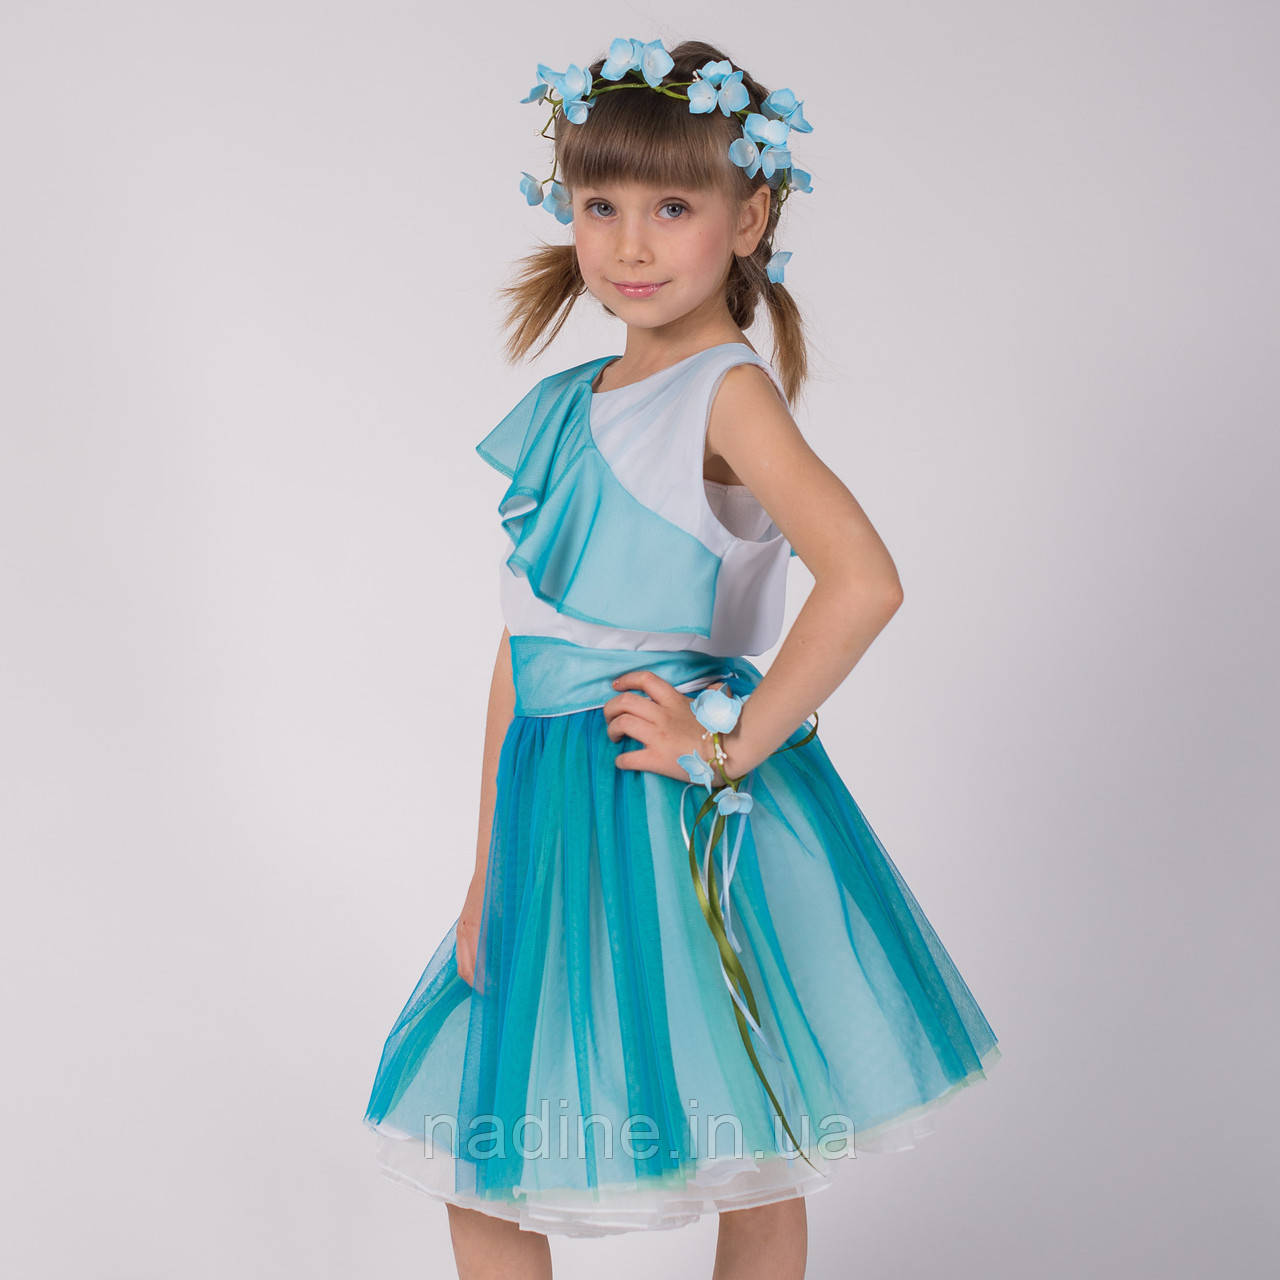 Шифоновое платье Nadine на девочку, Tender Hydrangea рост 134